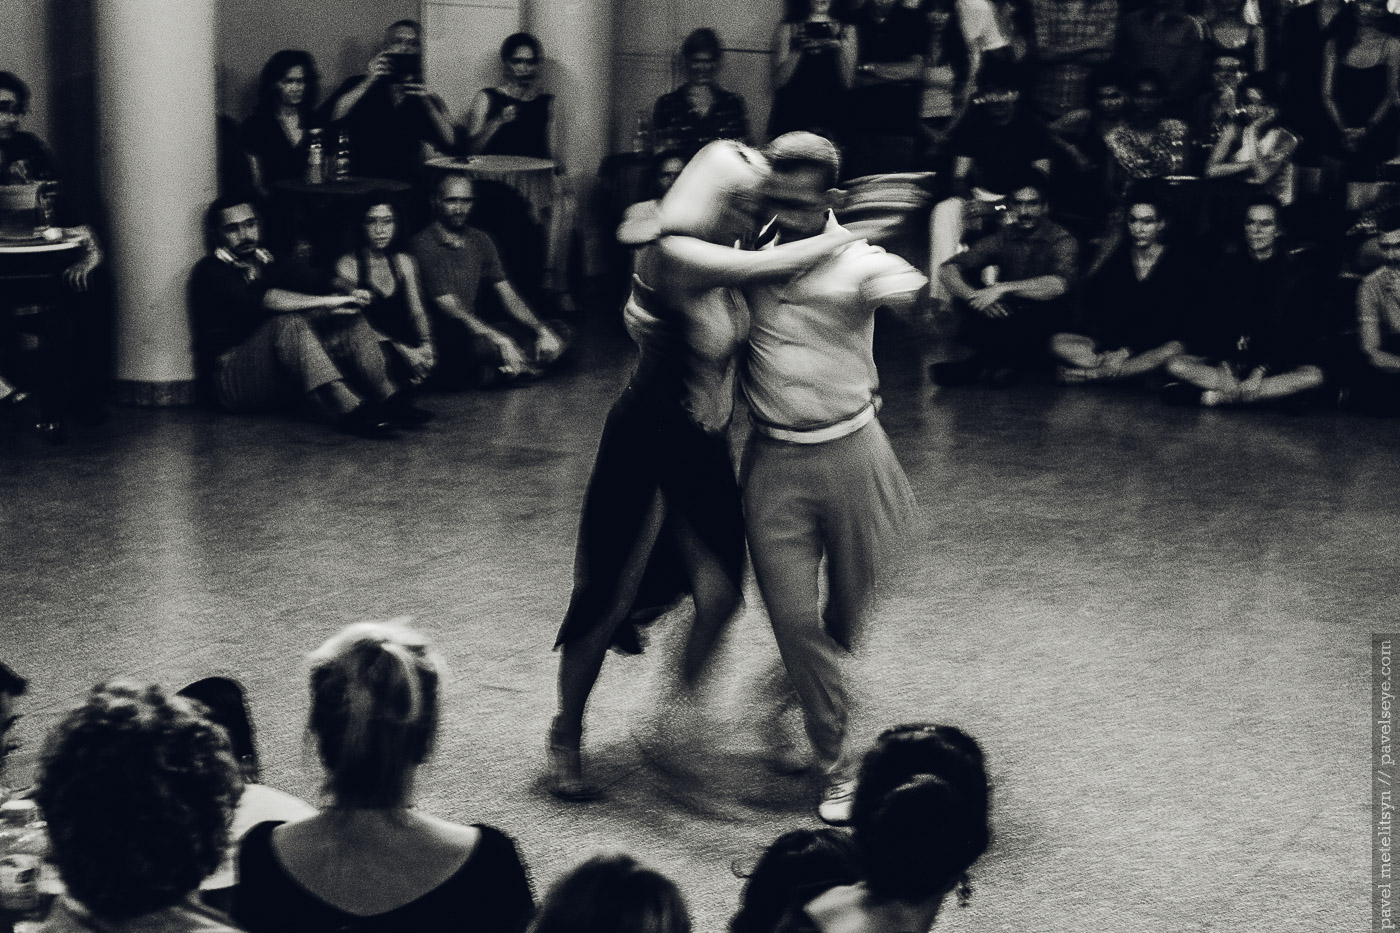 Alejandra Mantiñan & Martin Ojeda, Buenos Aires, 2016